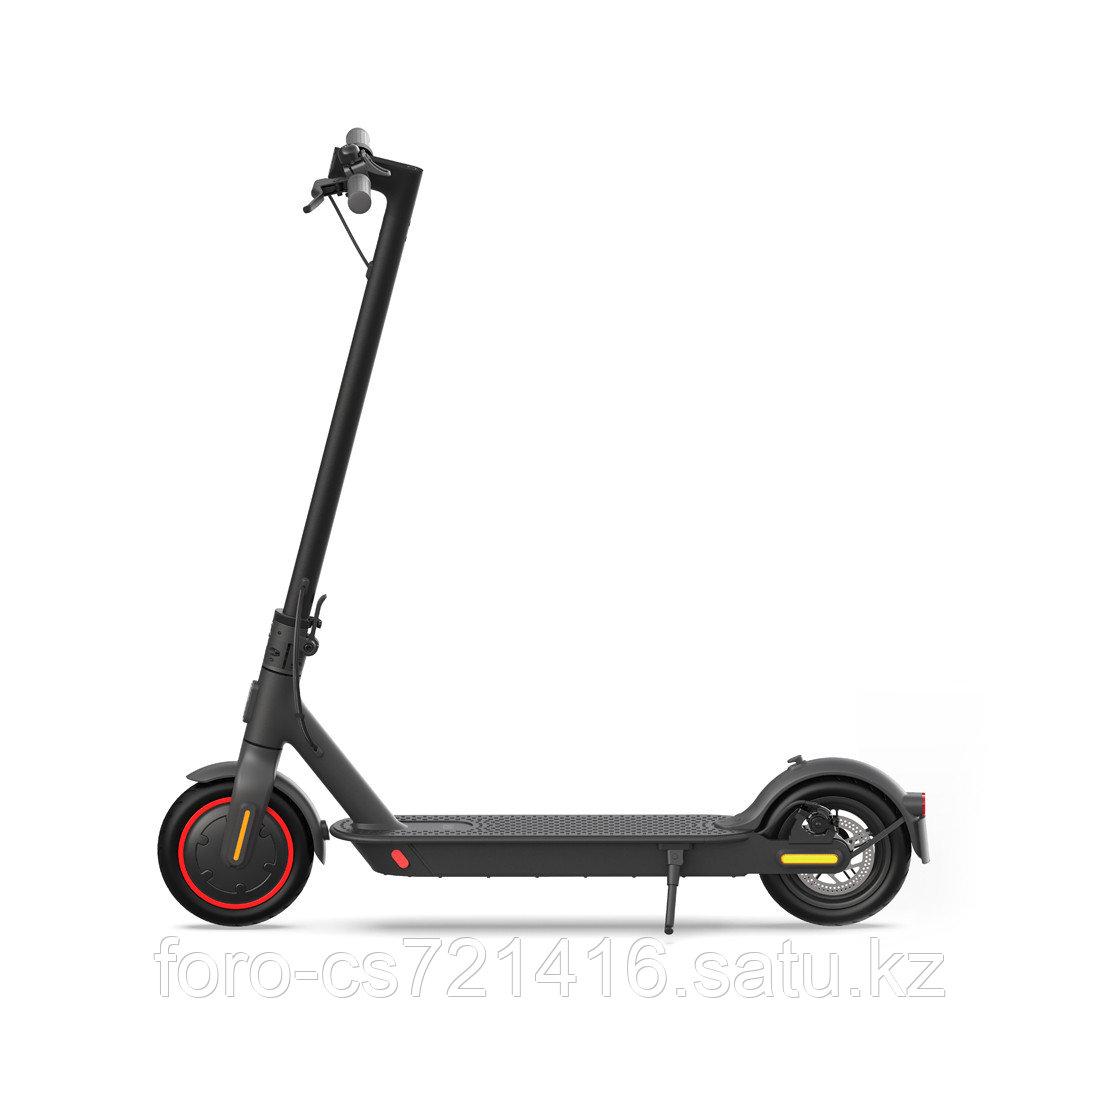 Электросамокат Xiaomi MiJia Smart Electric Scooter Pro 2 - фото 3